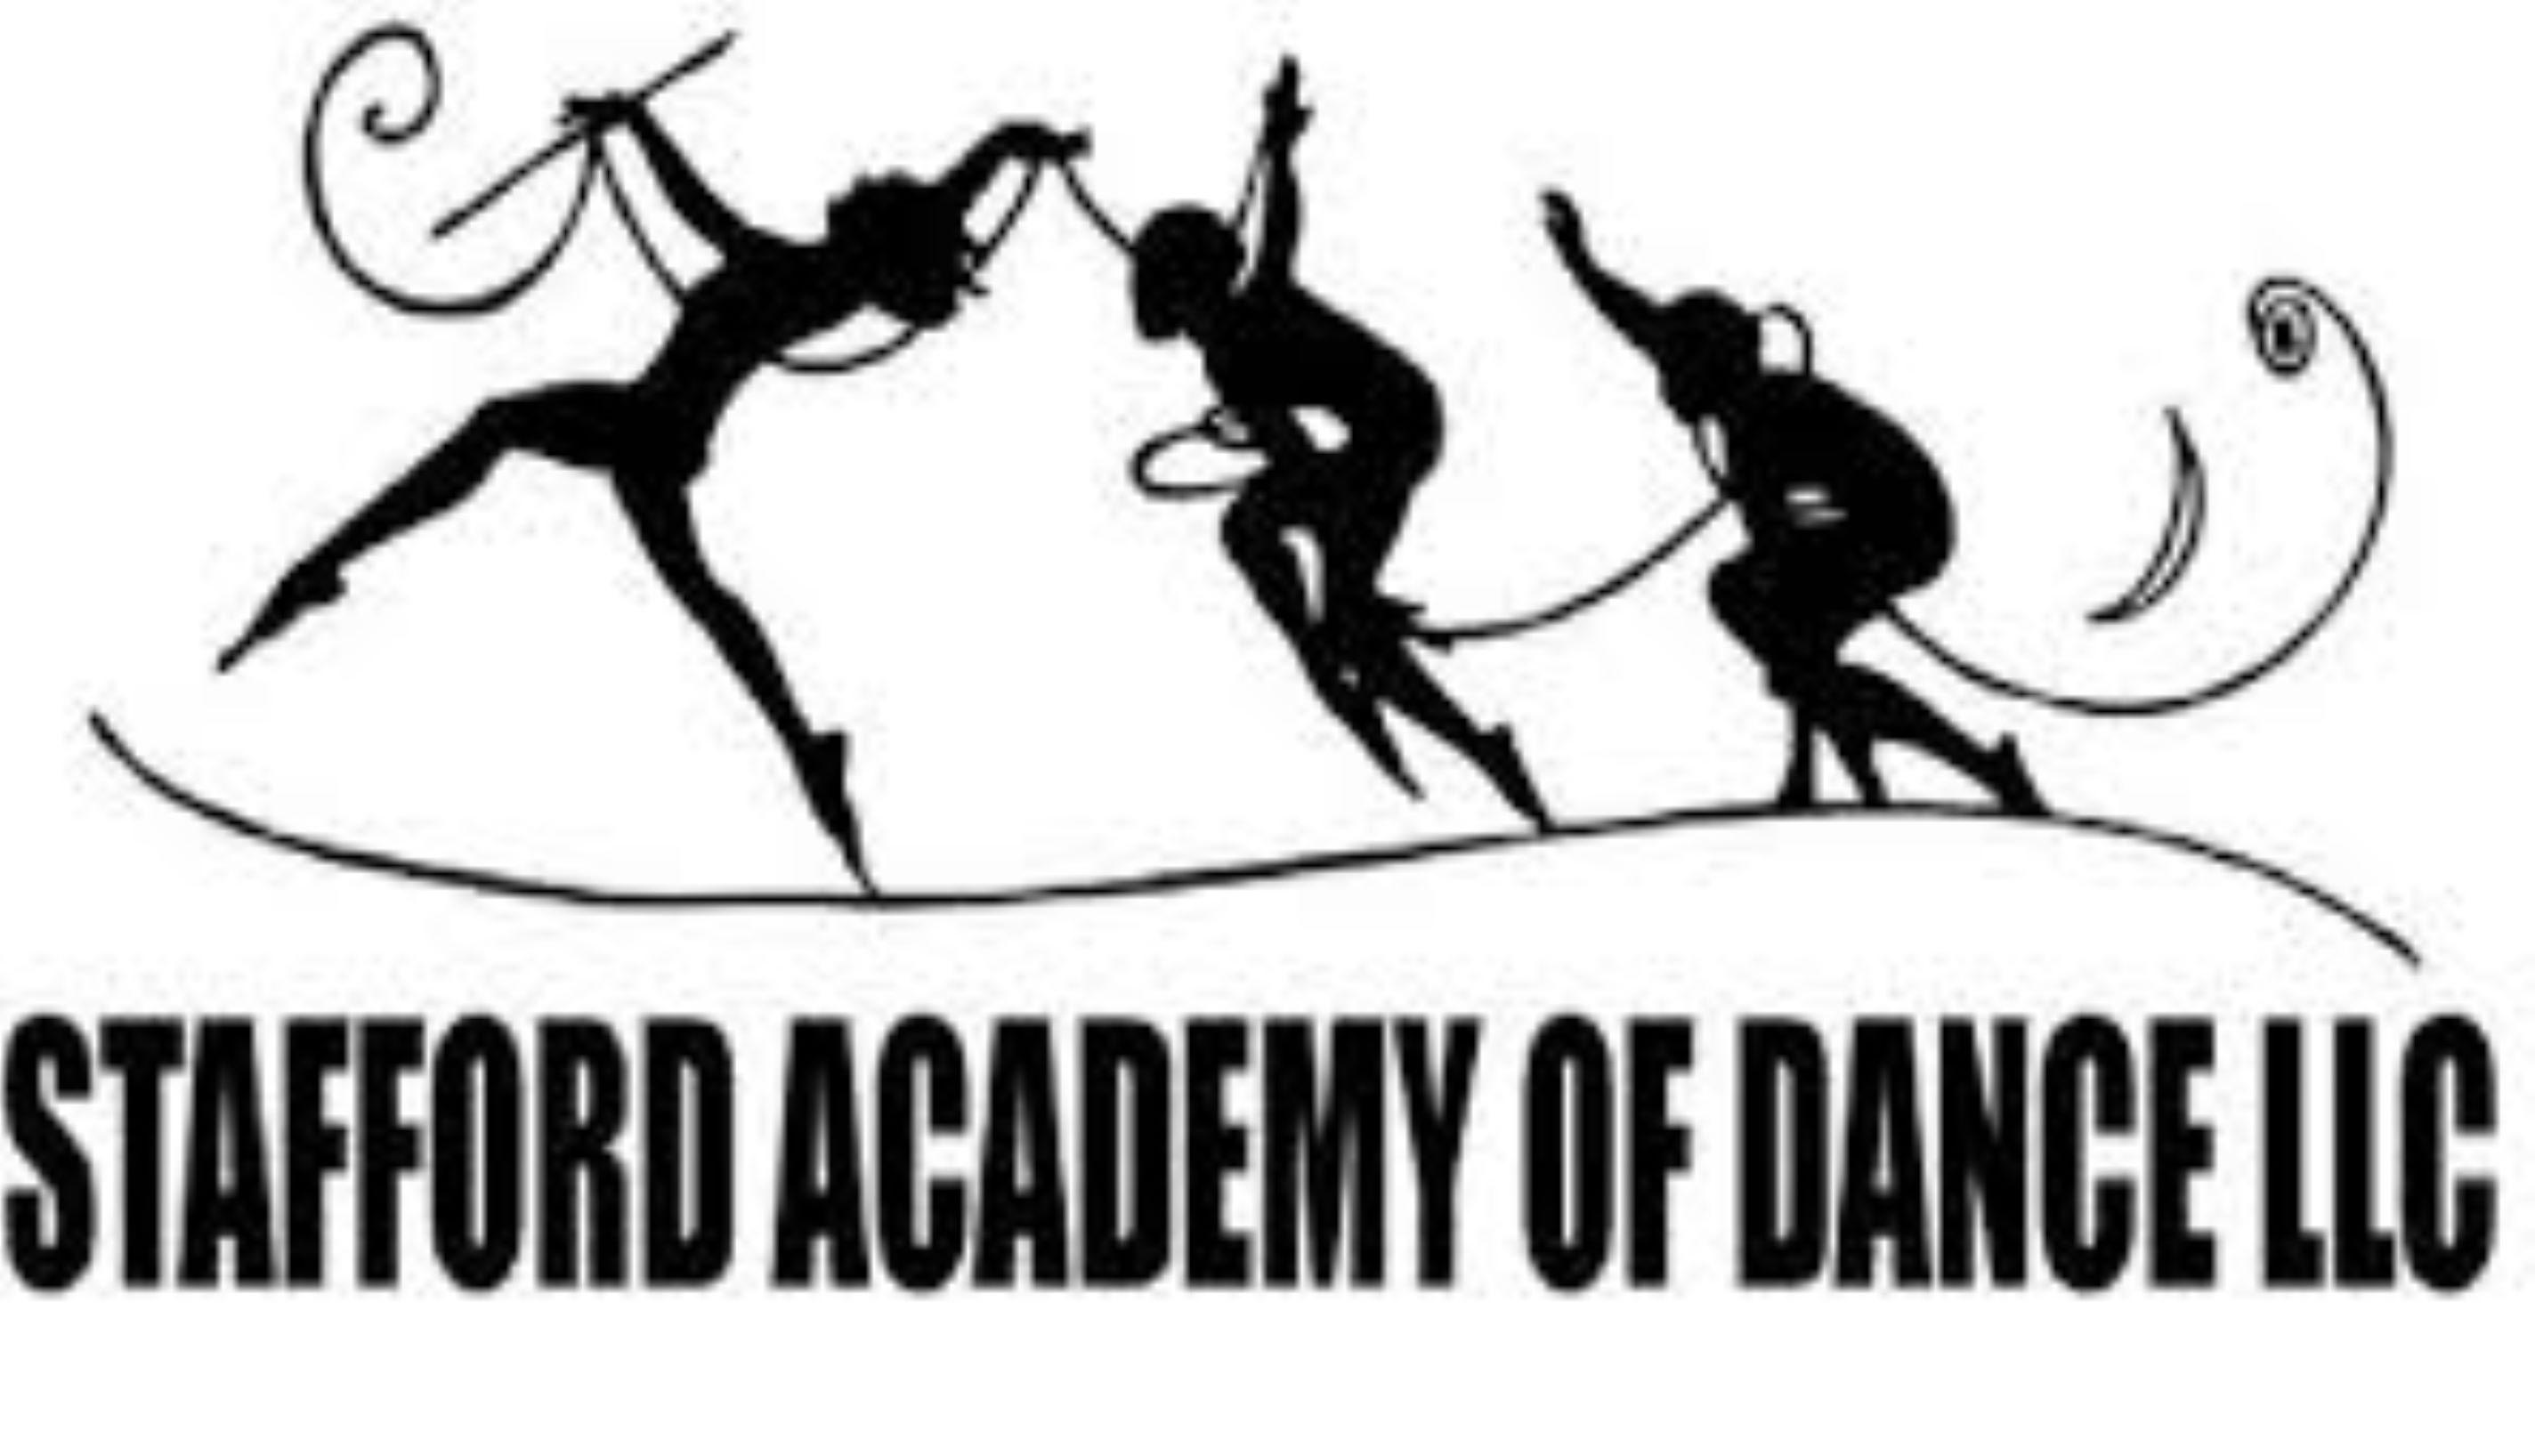 Stafford Academy of Dance